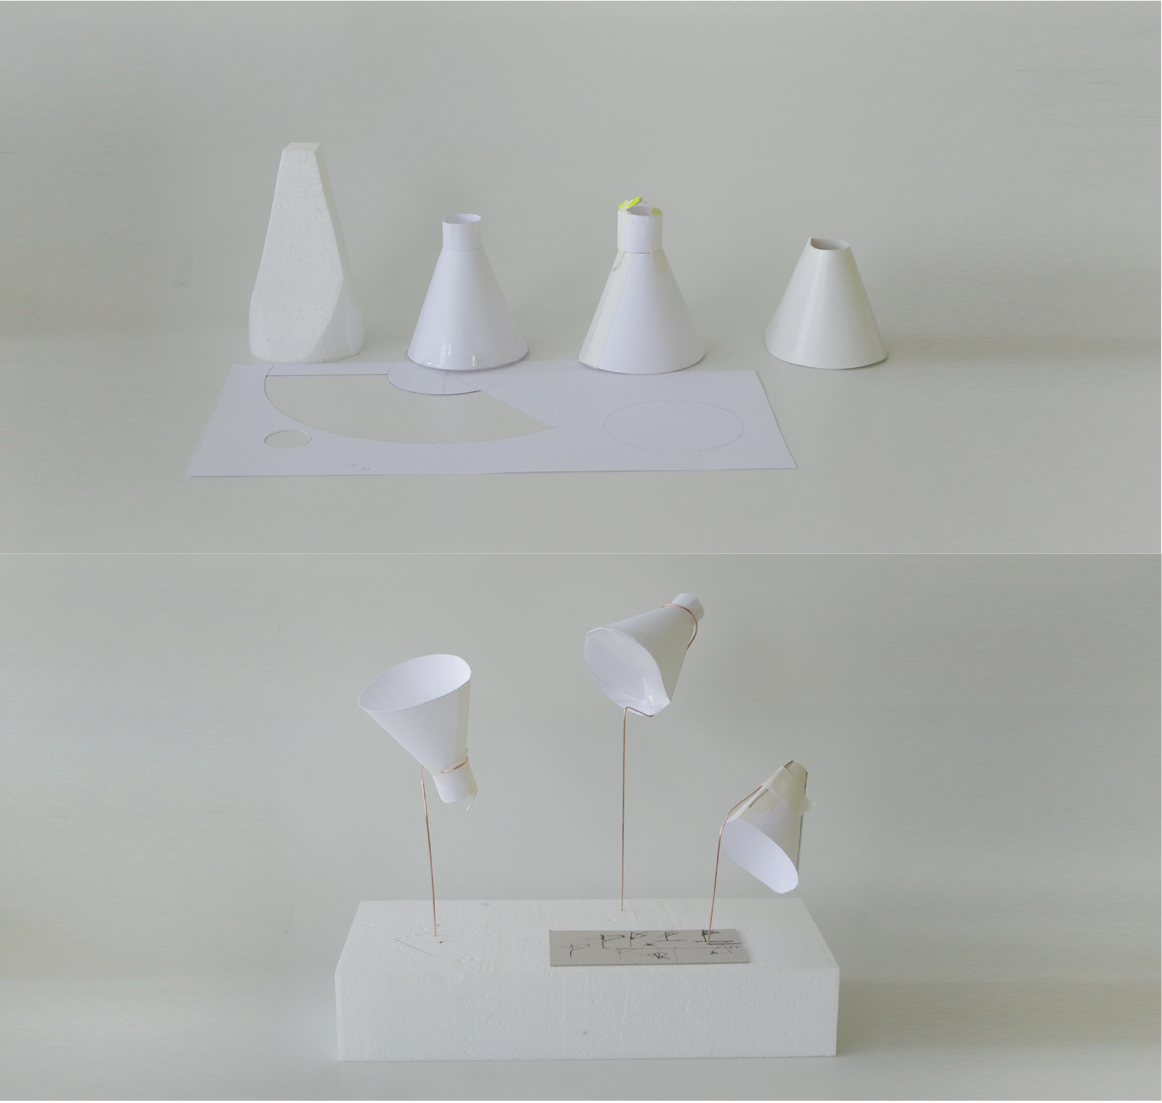 Sebastian Klawiter bewegtes Licht Produktdesign Skizzen Modelle